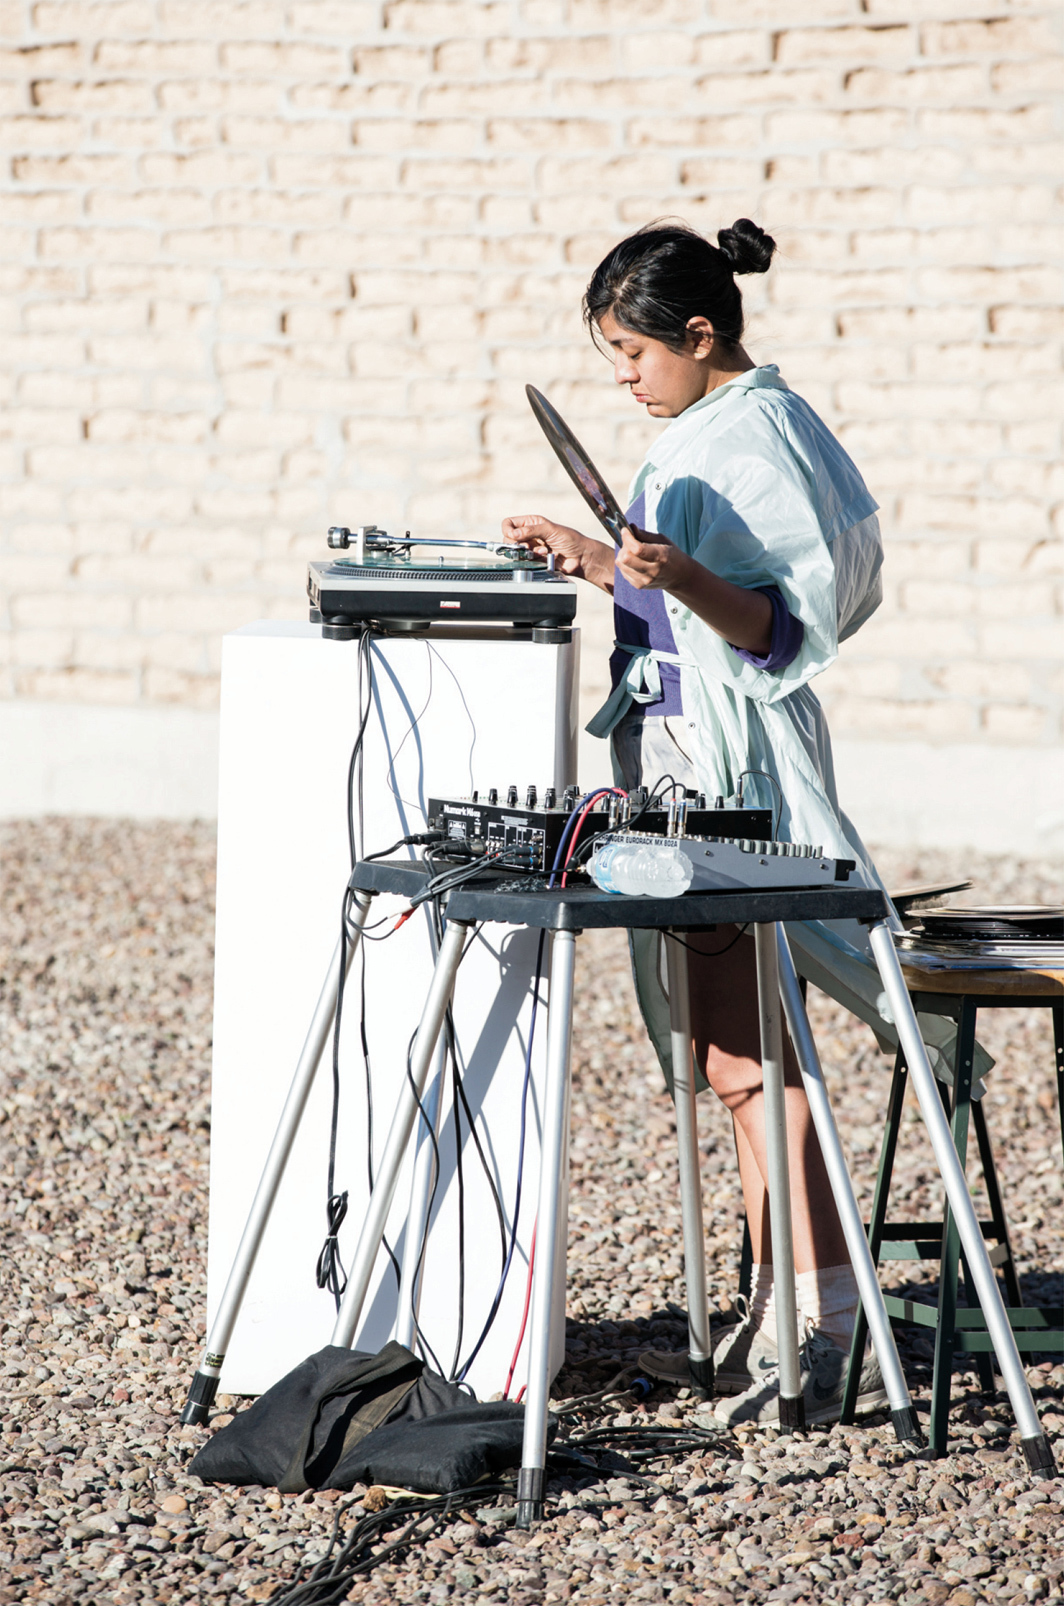 Maria Chávez performing at Marfa Myths, La Mansana de Chinati/The Block, Judd Foundation, Marfa, Texas, March 2016. Photo: Alex Marks.